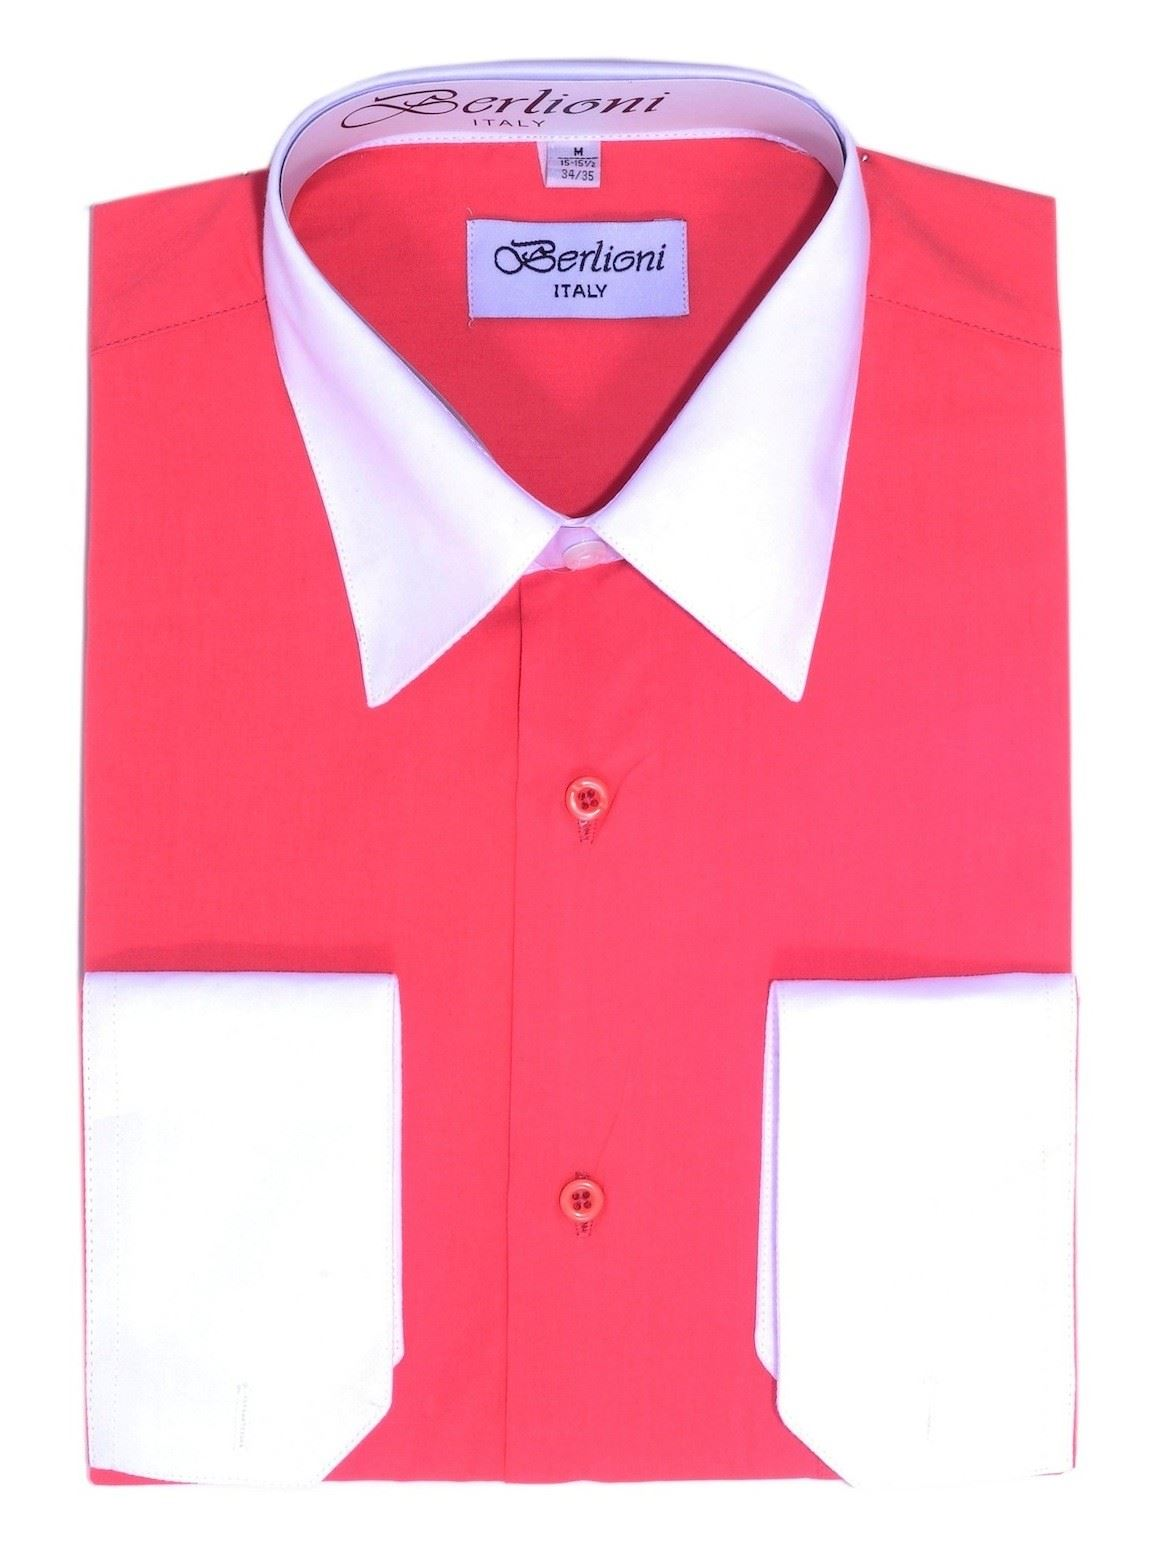 BERLIONI MEN/'S ITALY DRESS SHIRT TWO TONE SHIRT FRENCH CONVERTIBLE CUFF LEMON